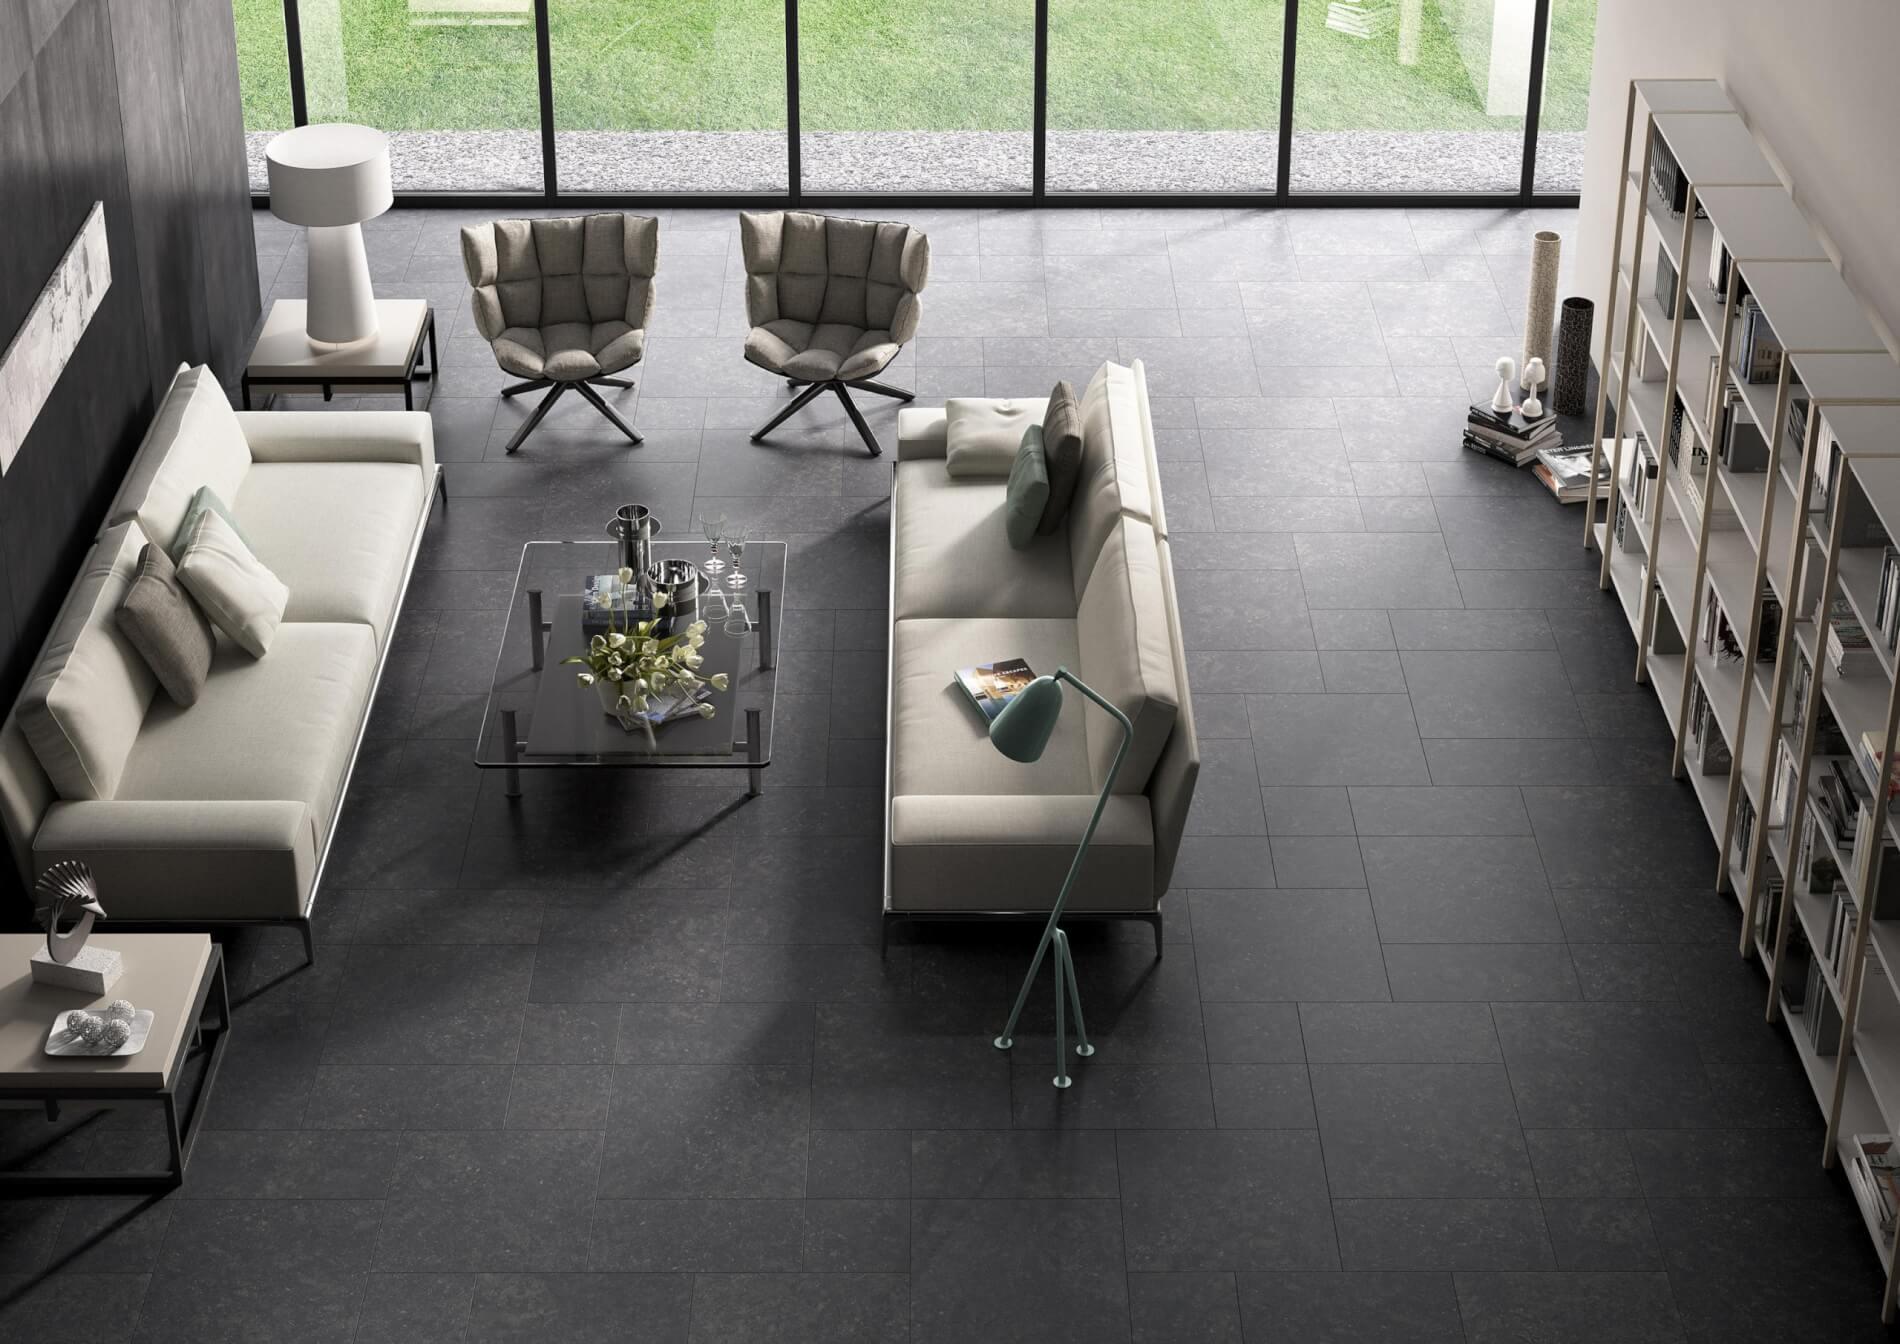 Conservatory Design Trends in 2020 - Dark Stone Flooring